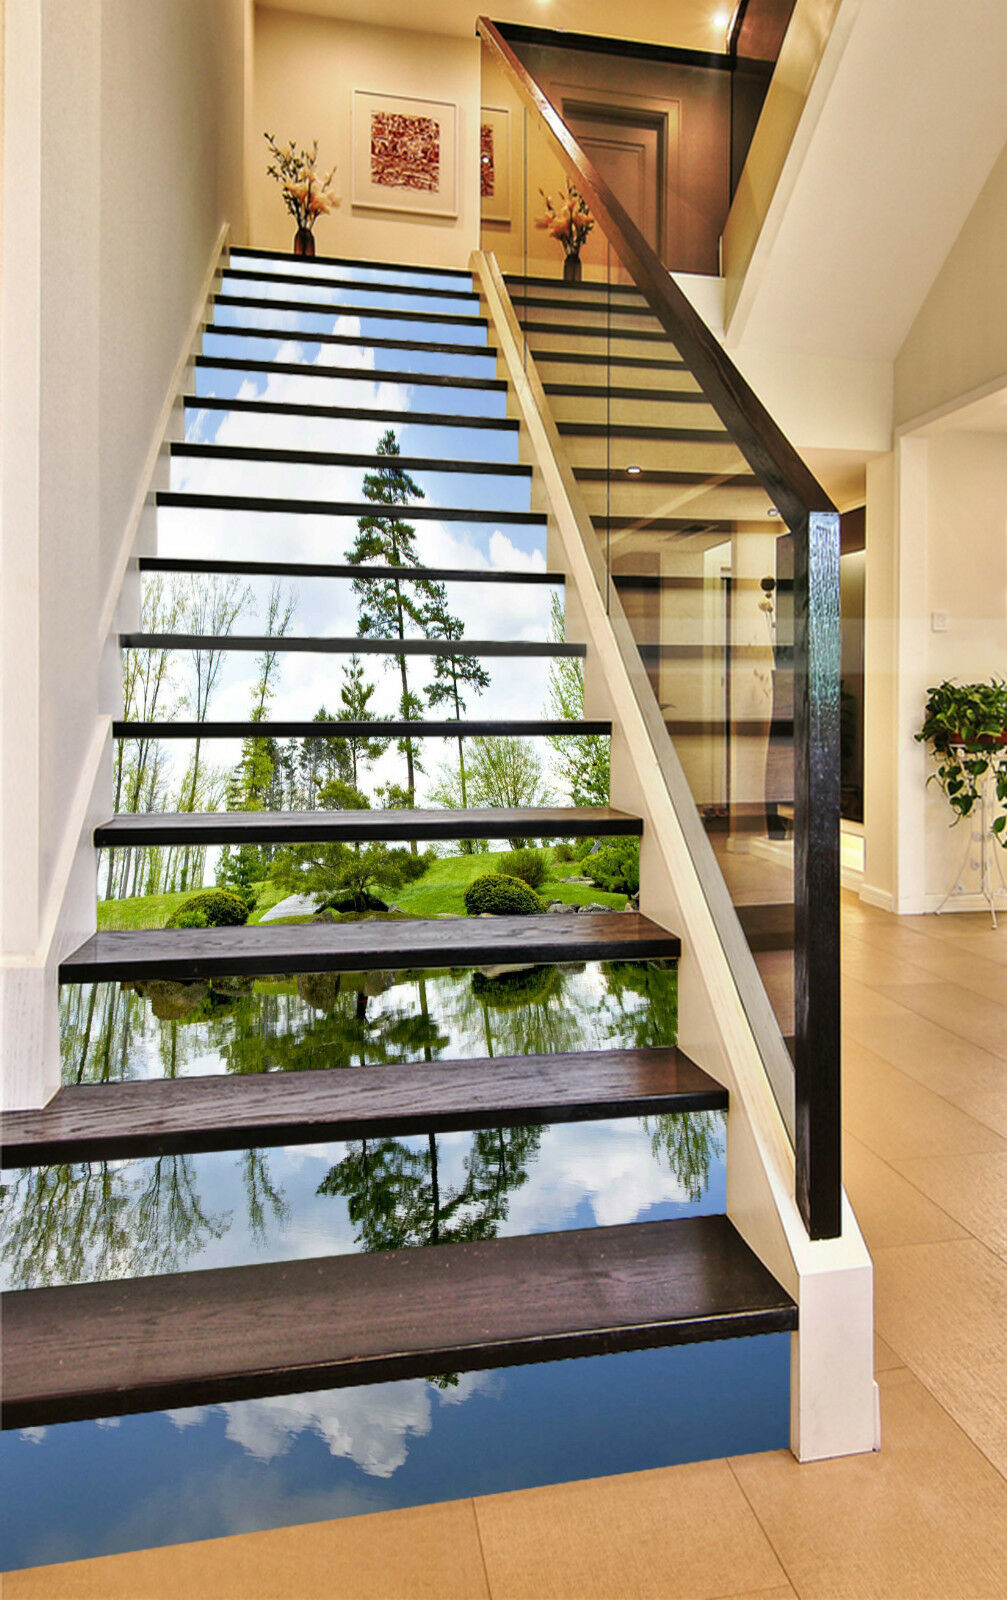 3D Wald See 432 Stair Risers Dekoration Fototapete Vinyl Aufkleber Tapete DE